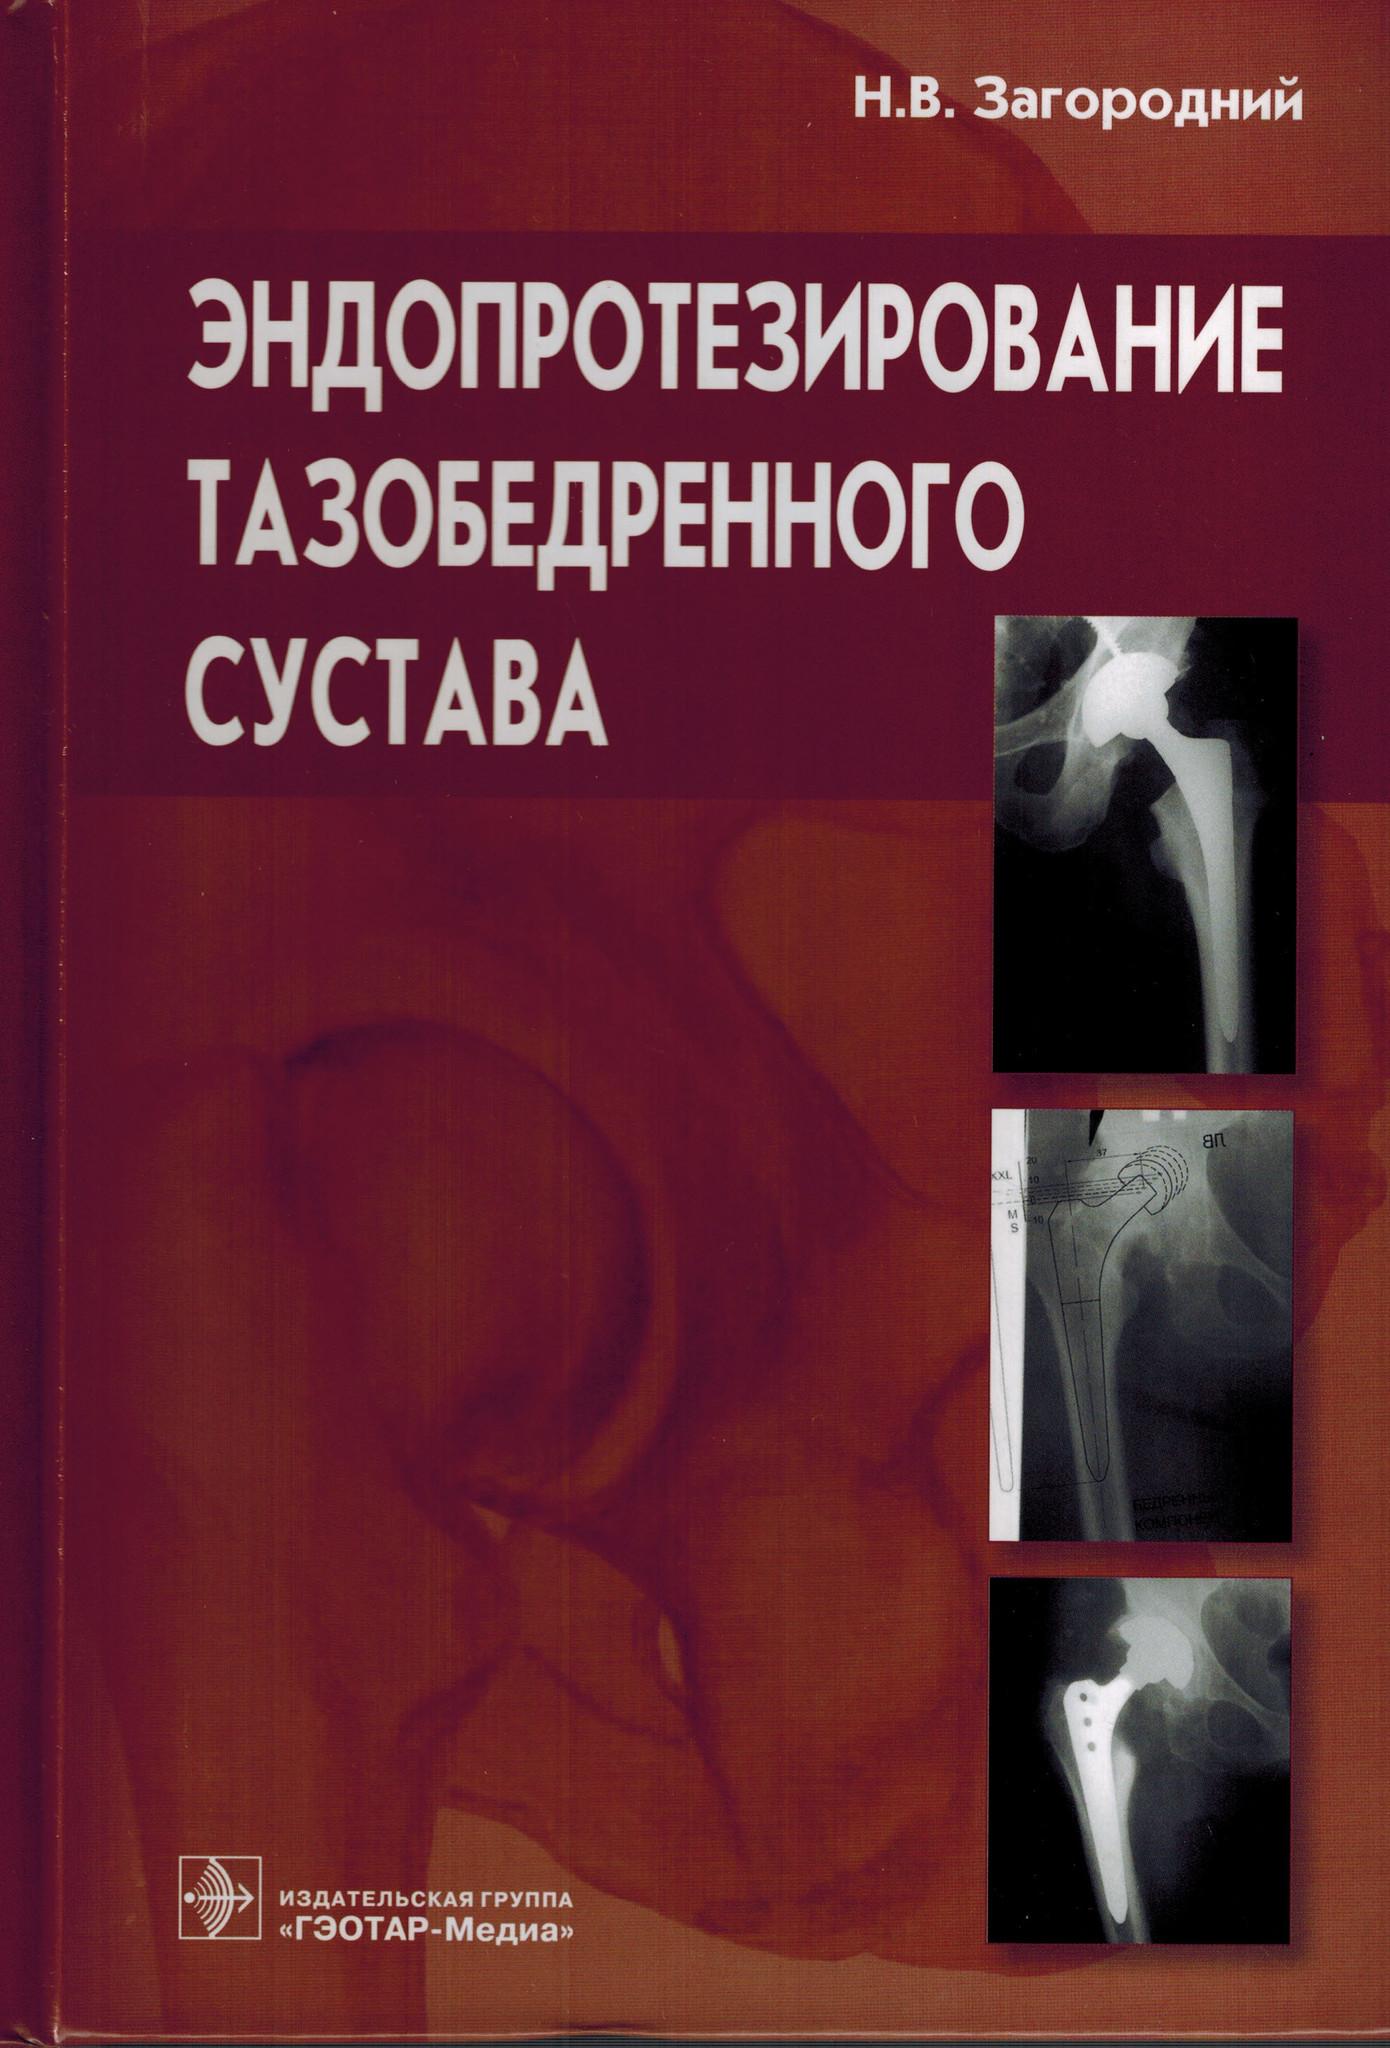 Эндопротез Эндопротезирование тазобедренного сустава. Основы и практика ets.jpg